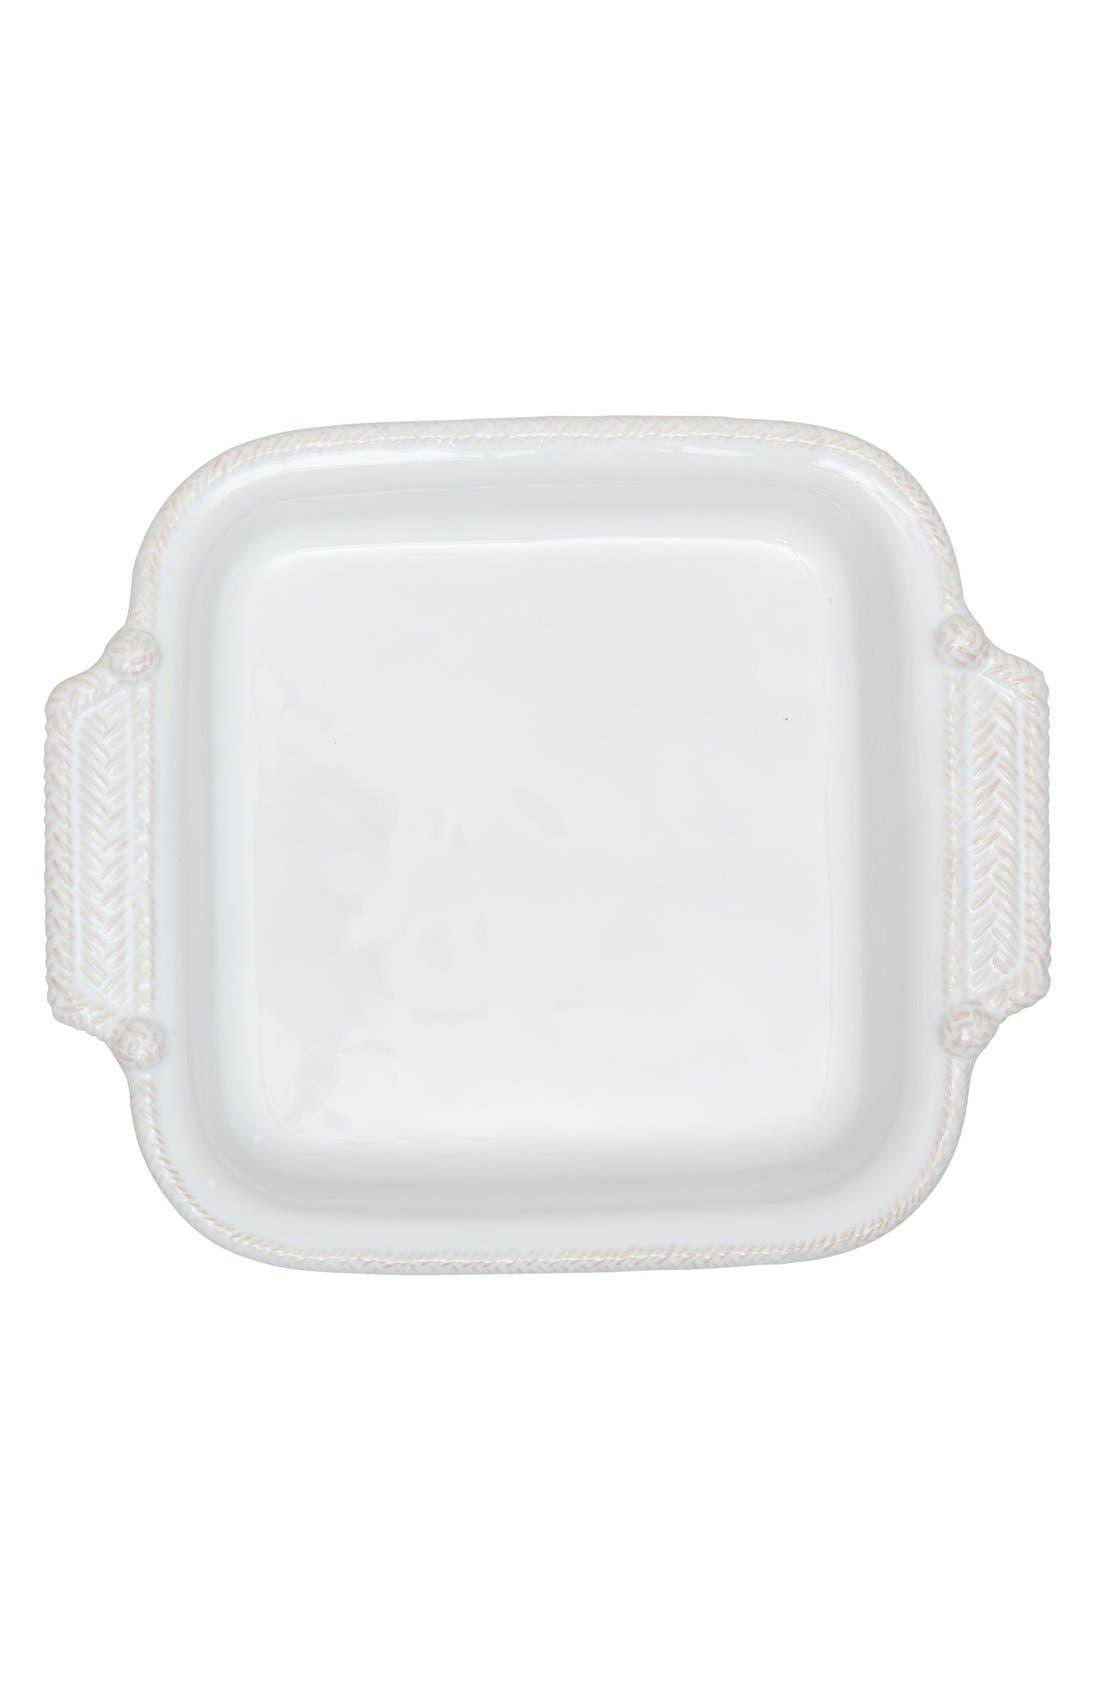 Le Panier 2-Quart Square Baking Dish,                         Main,                         color, 100